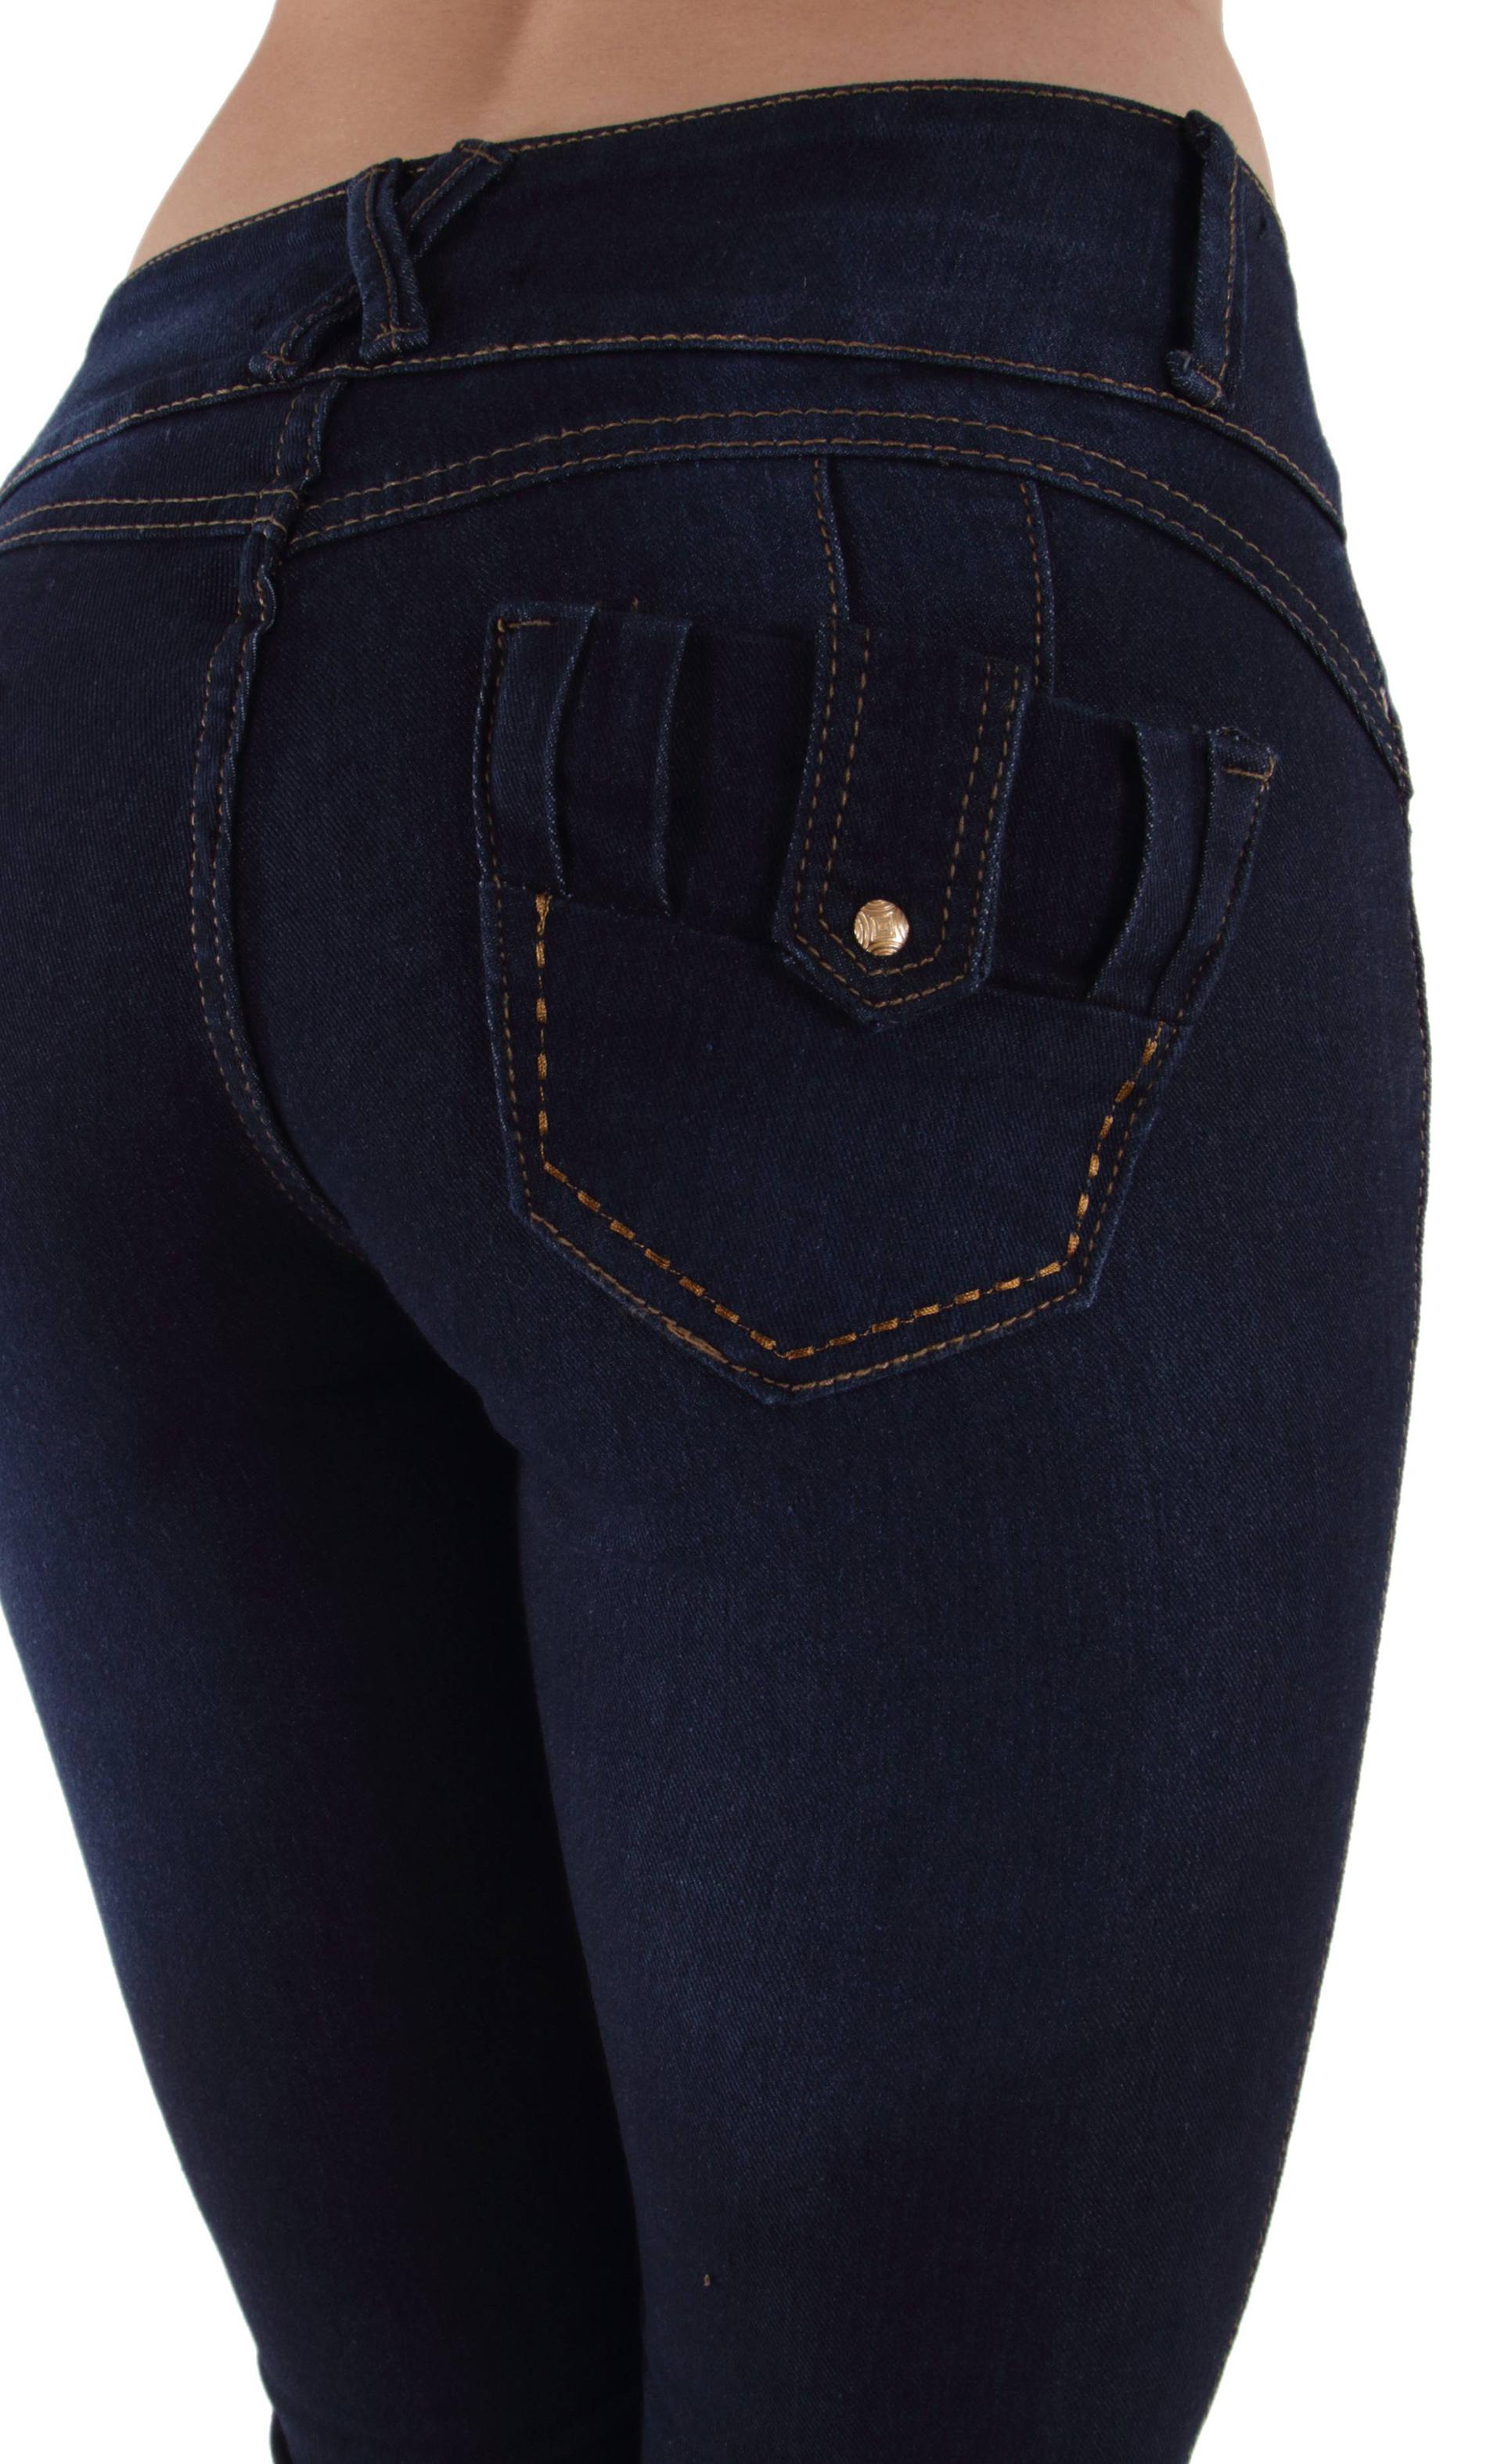 butt lift jeans stitching detail